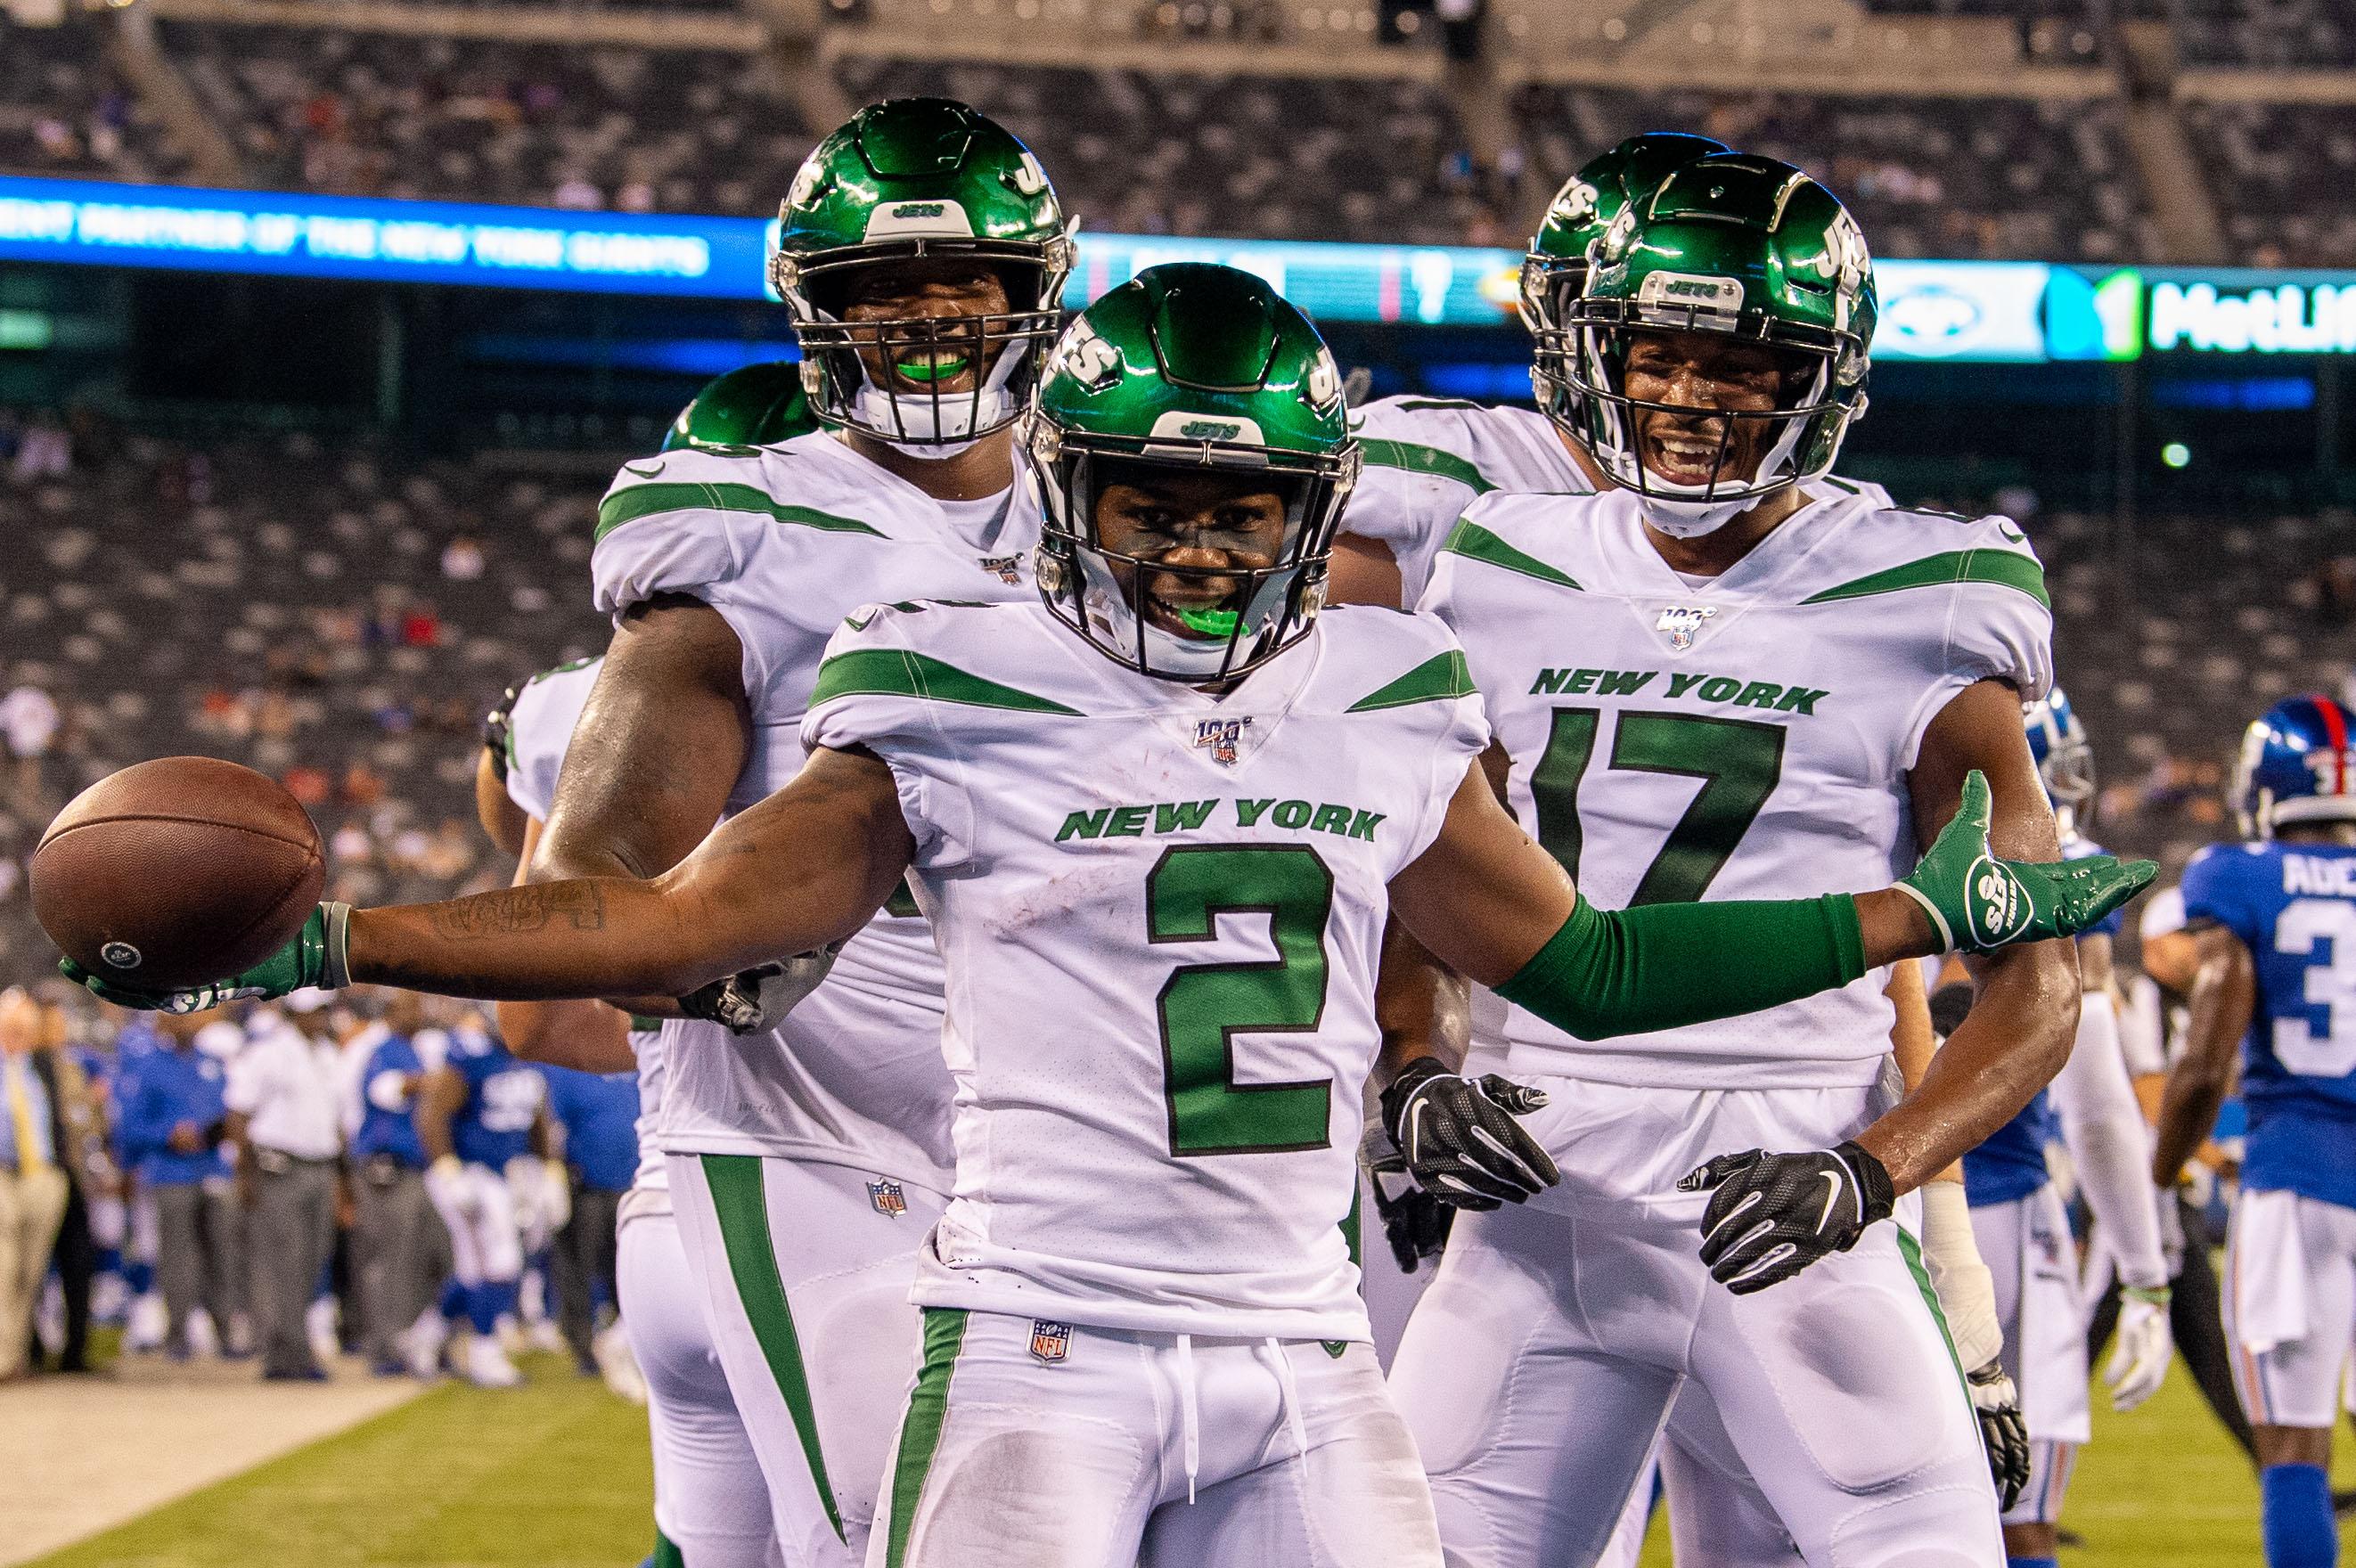 NFL: Preseason-New York Jets at New York Giants